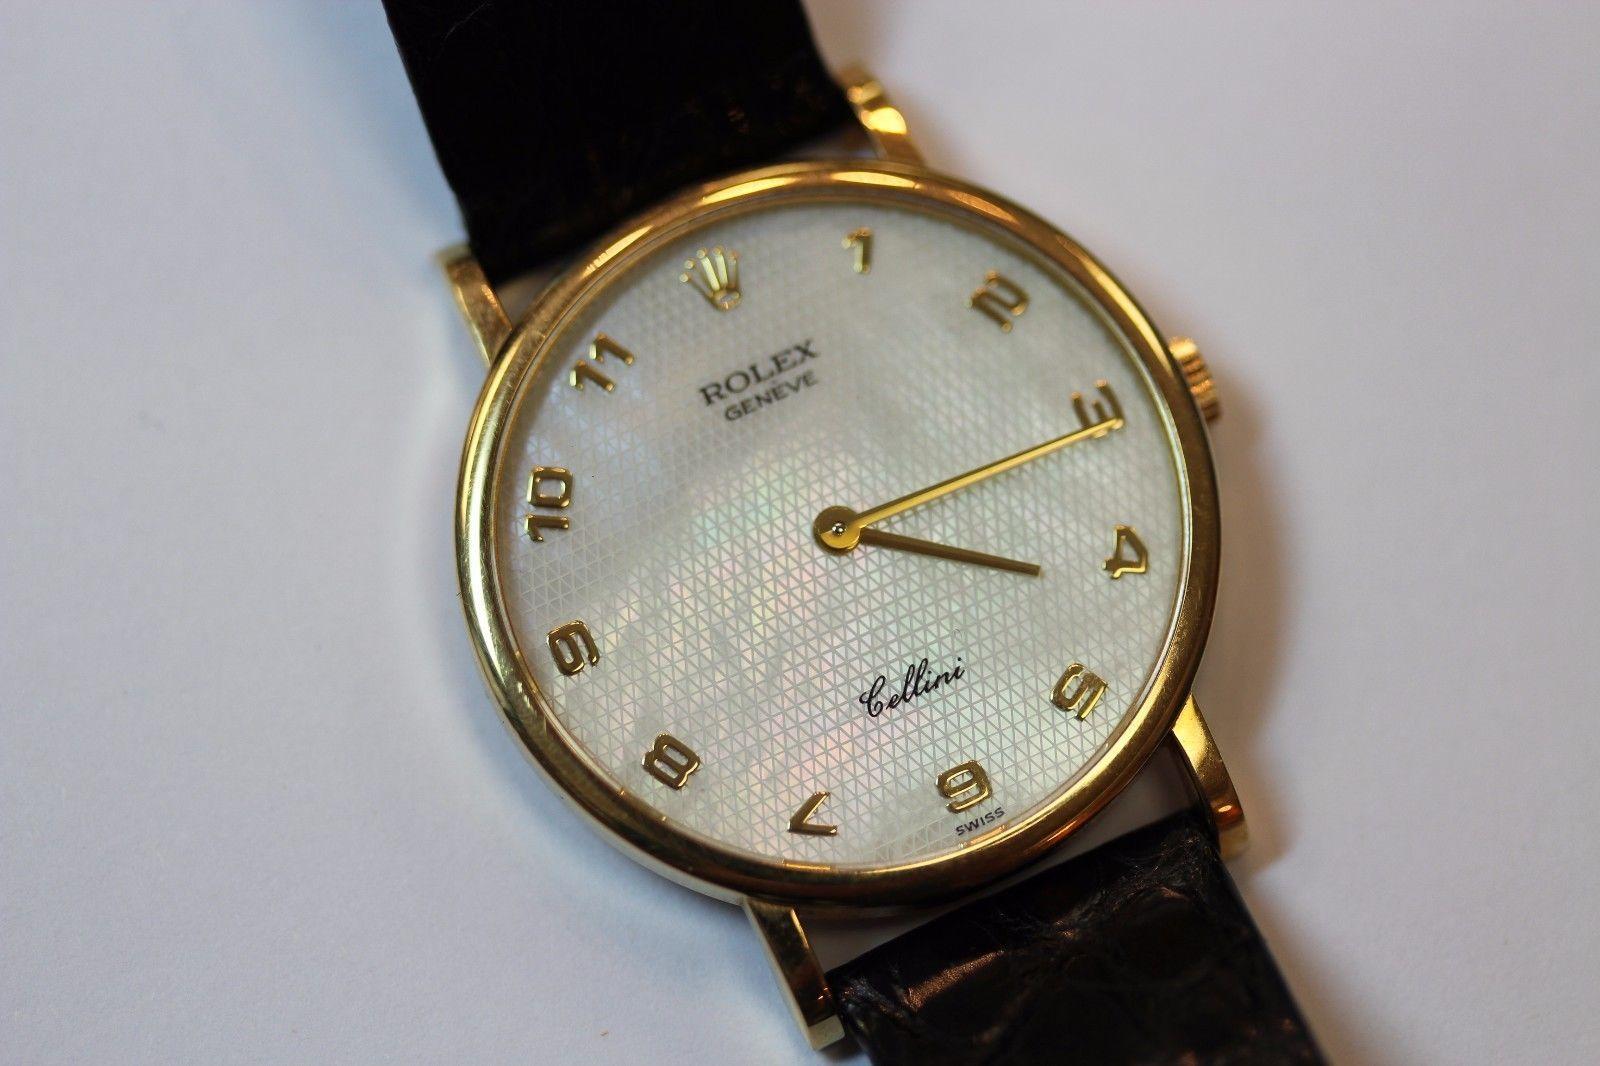 Brand jfa on wristwatches